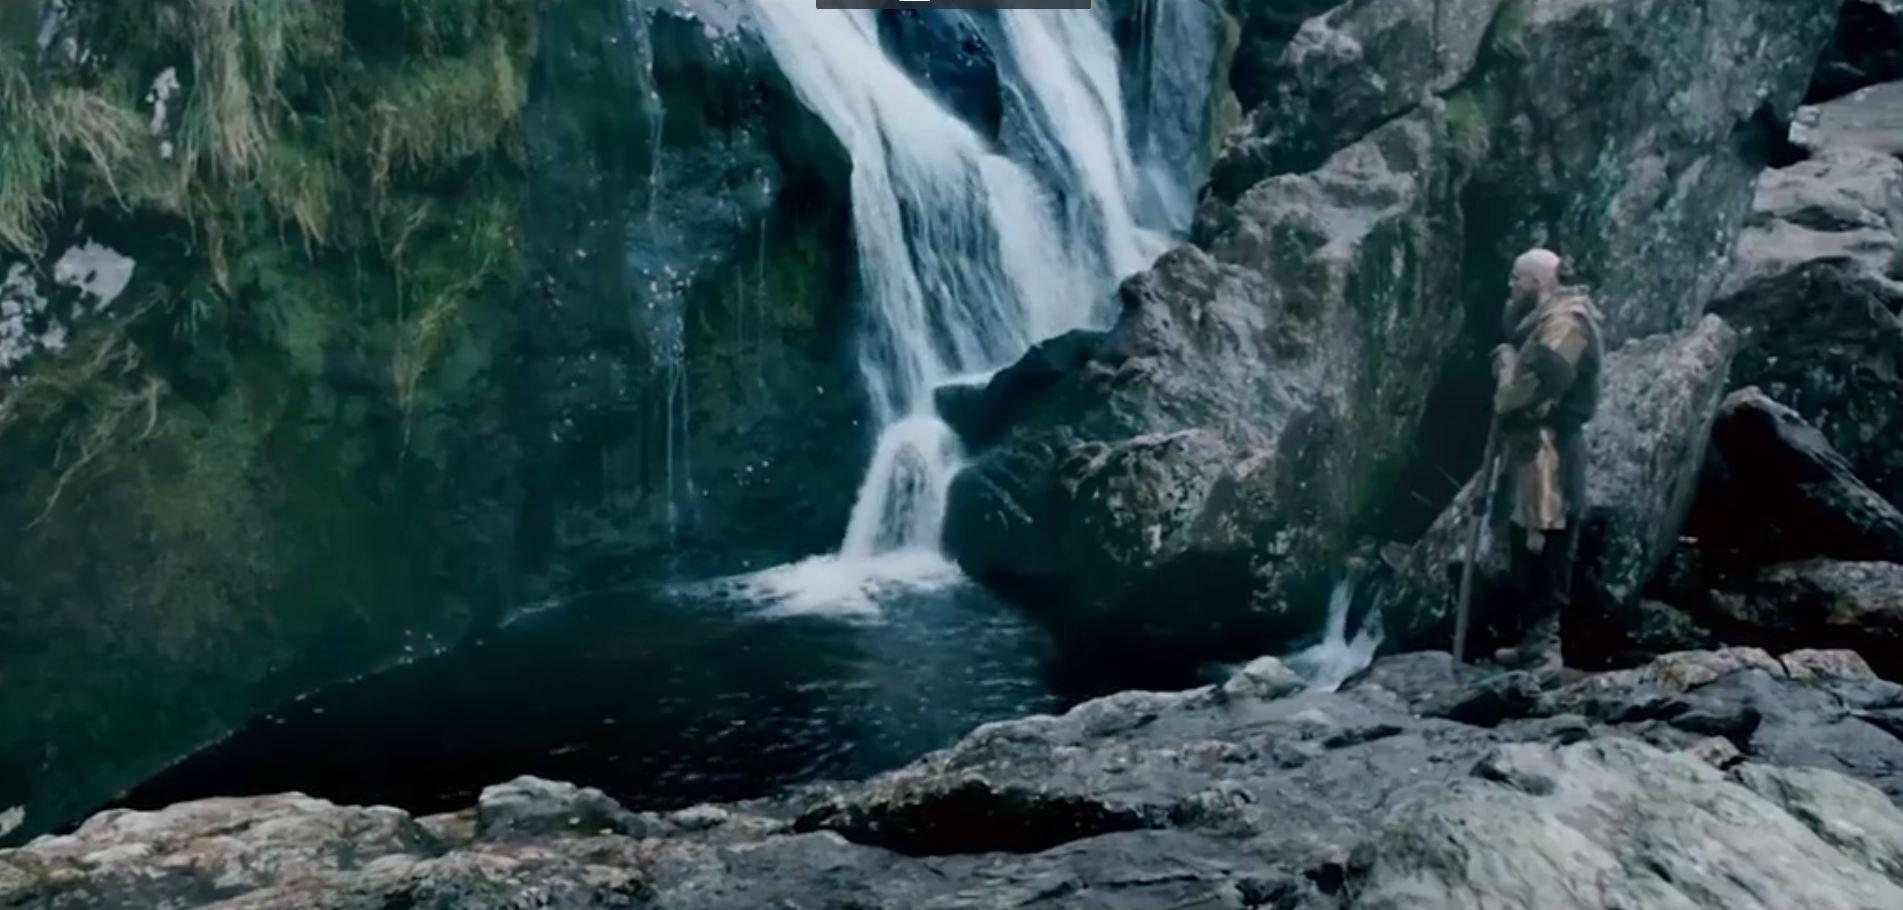 Vikings season 5B episode 2 trailer Provider: History